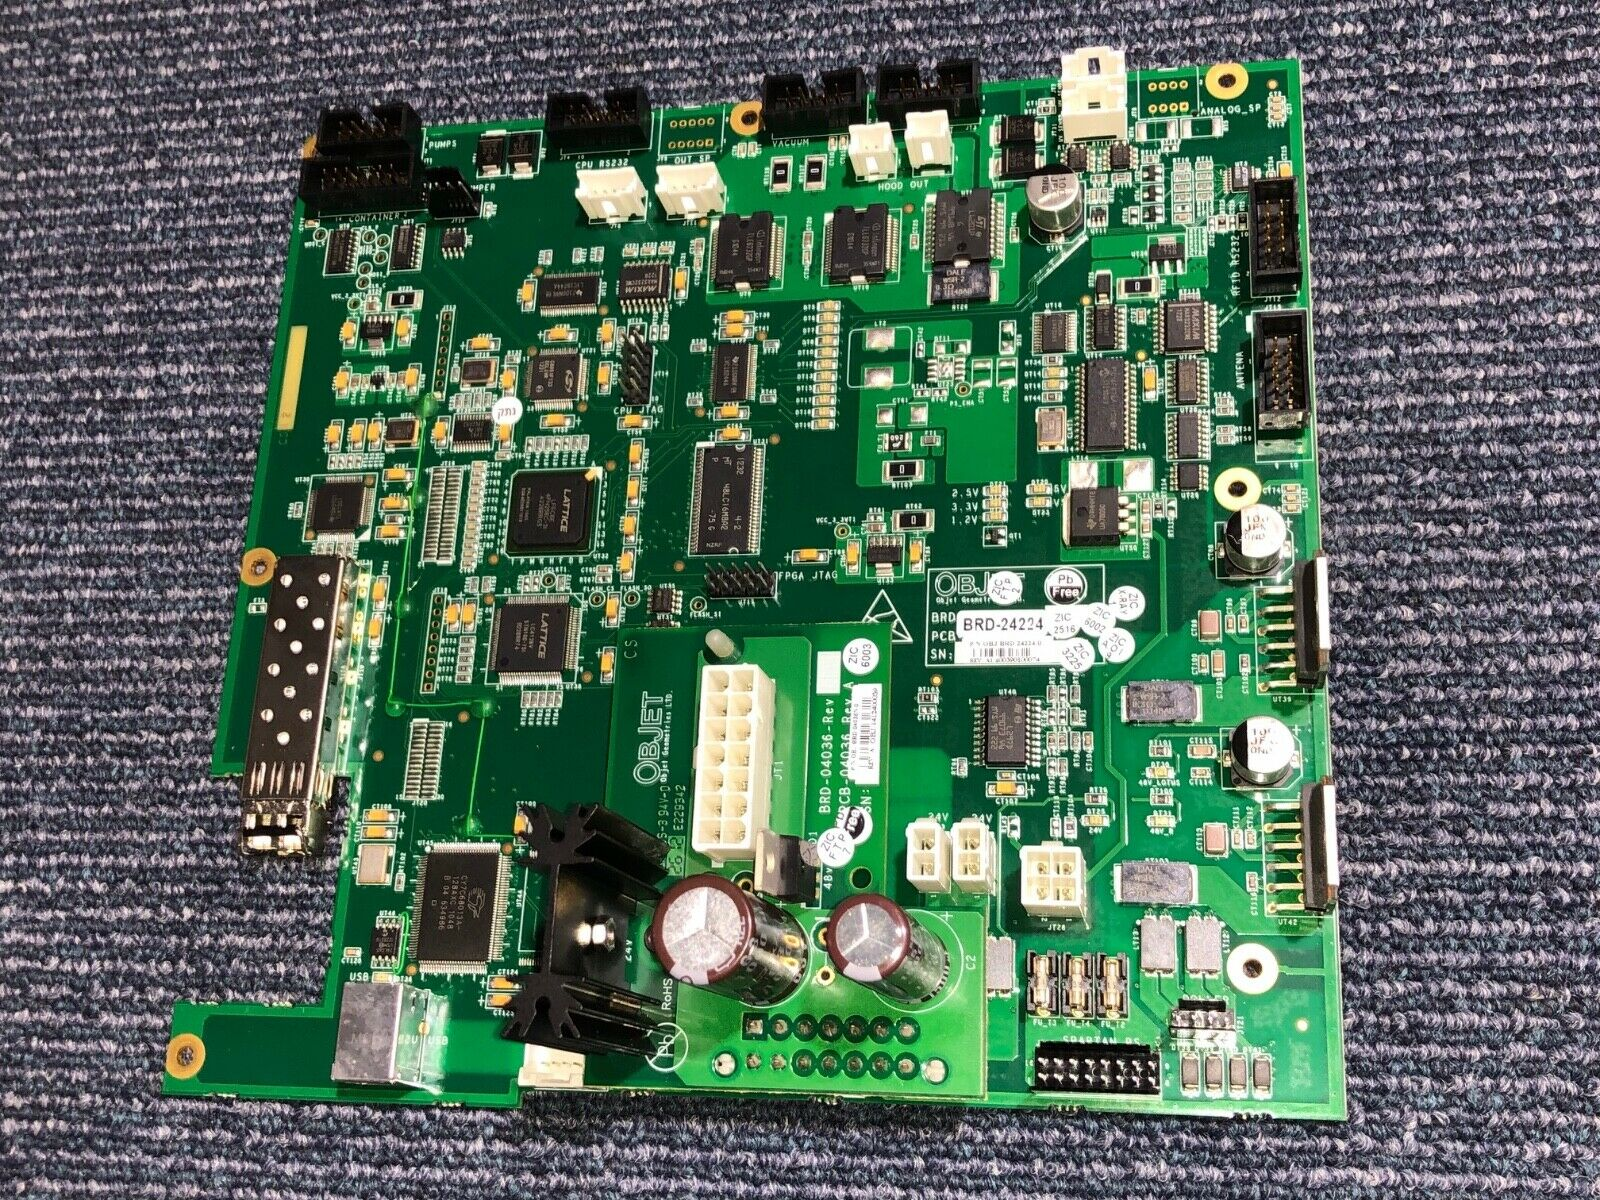 Stratasys Objet30 scholar BRD-24224 Board